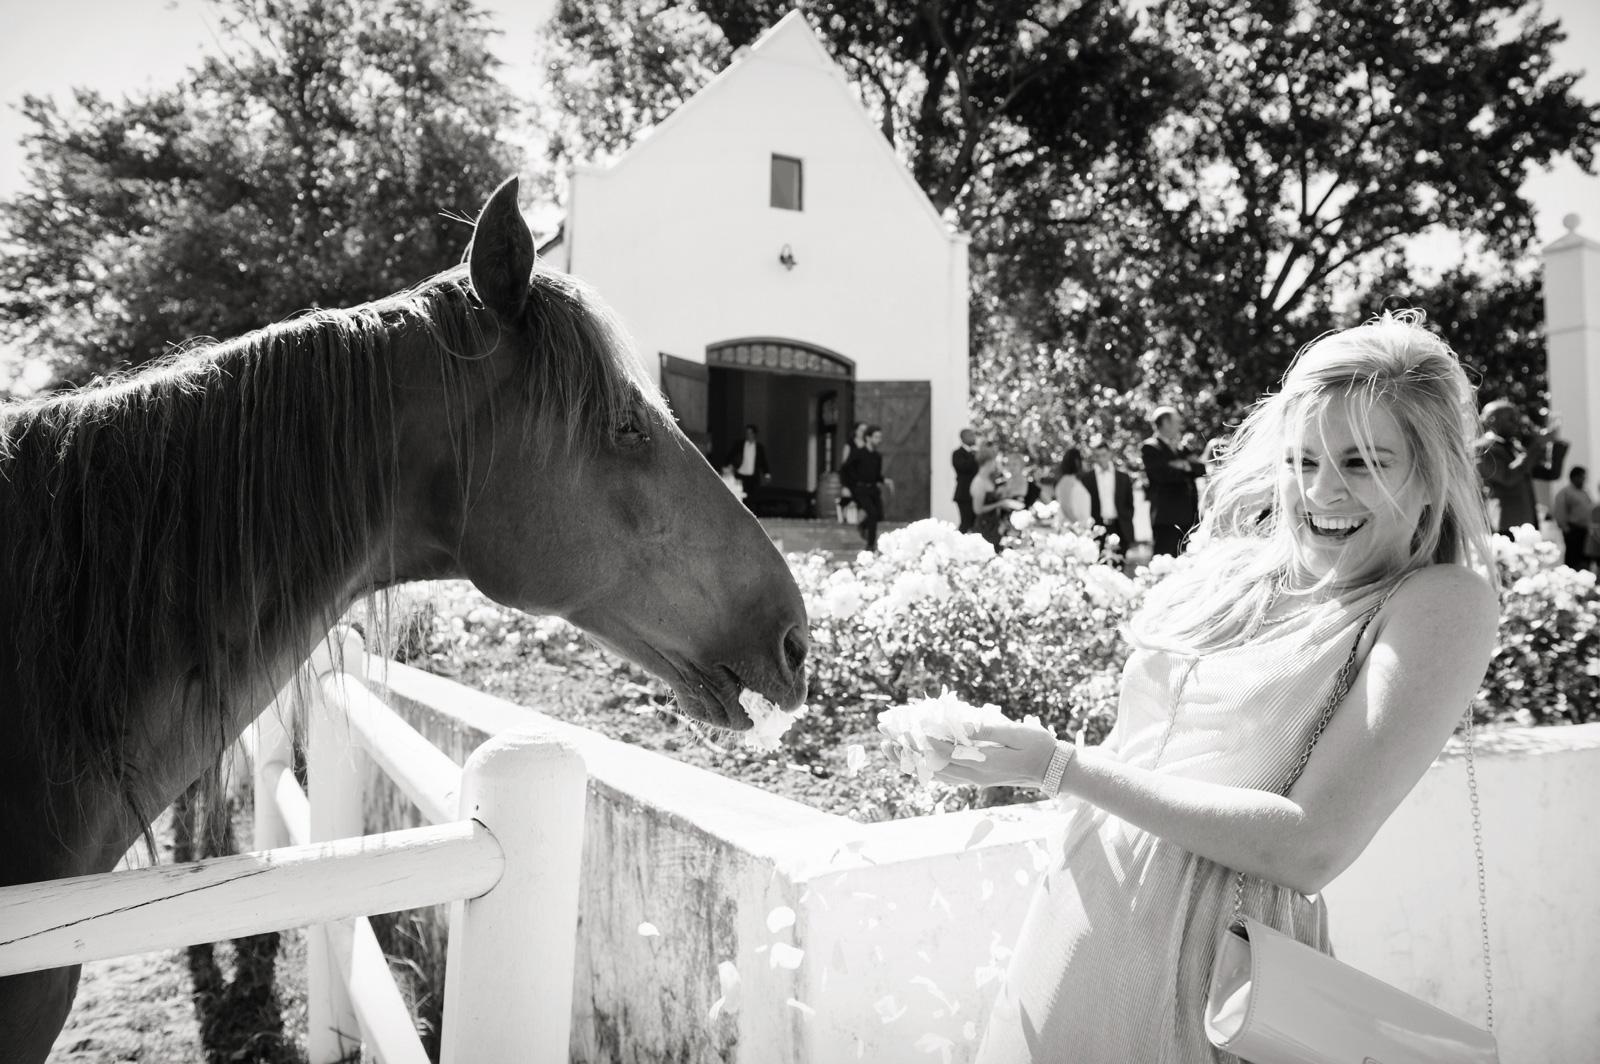 Horse attacks woman